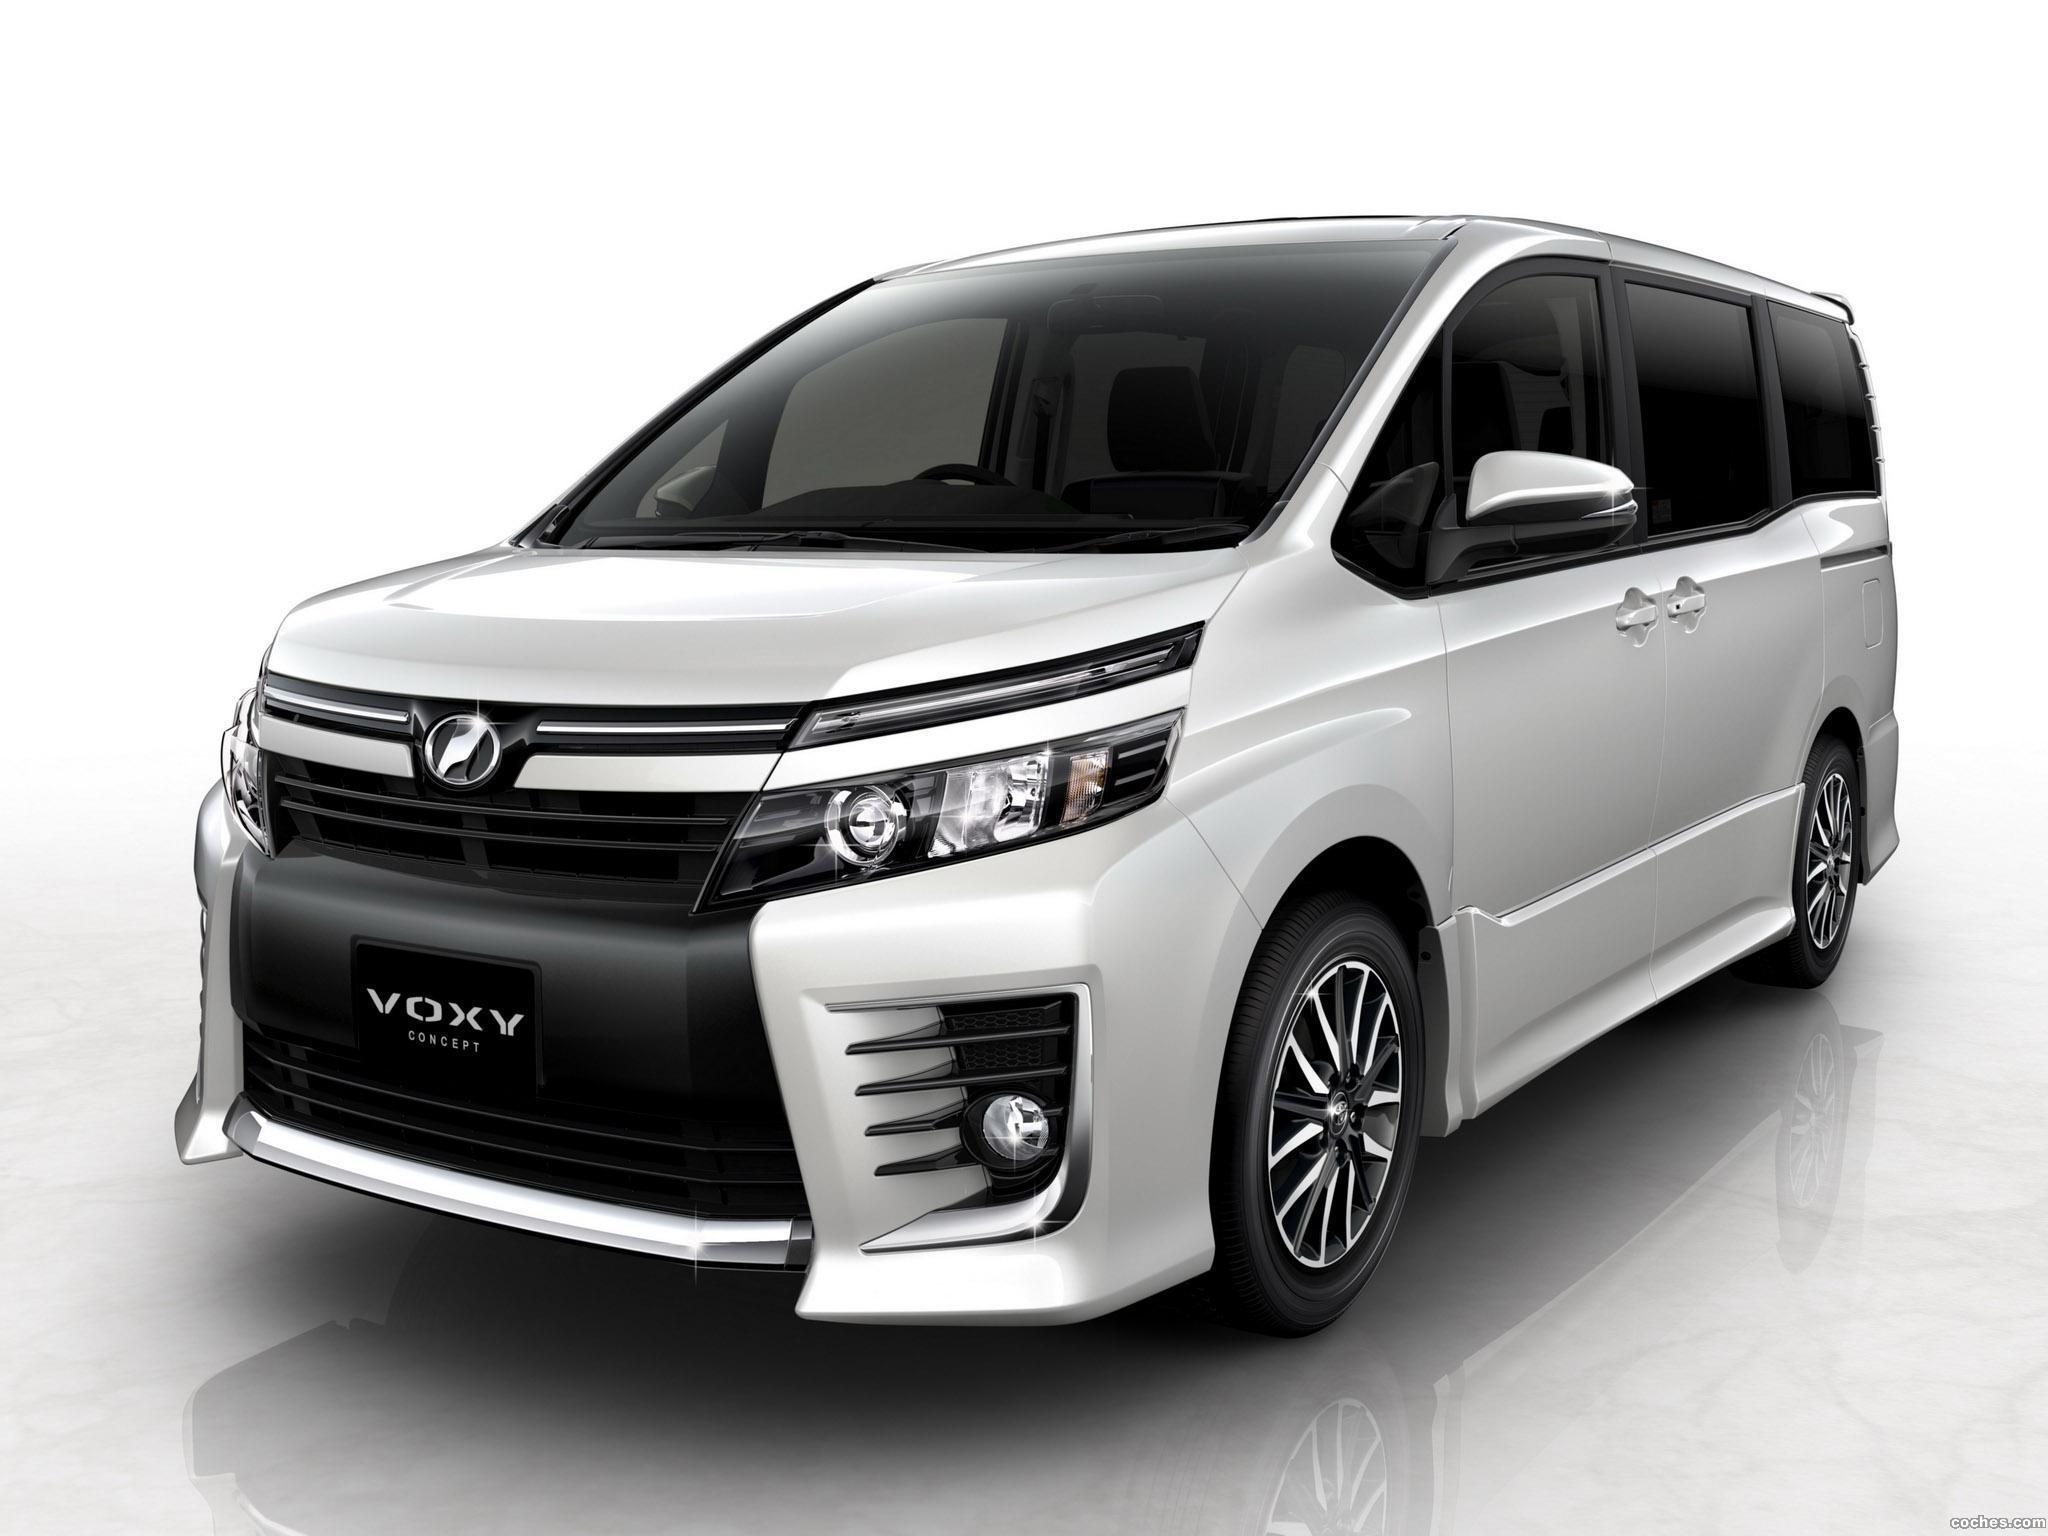 Foto 0 de Toyota Voxy Concept 2013